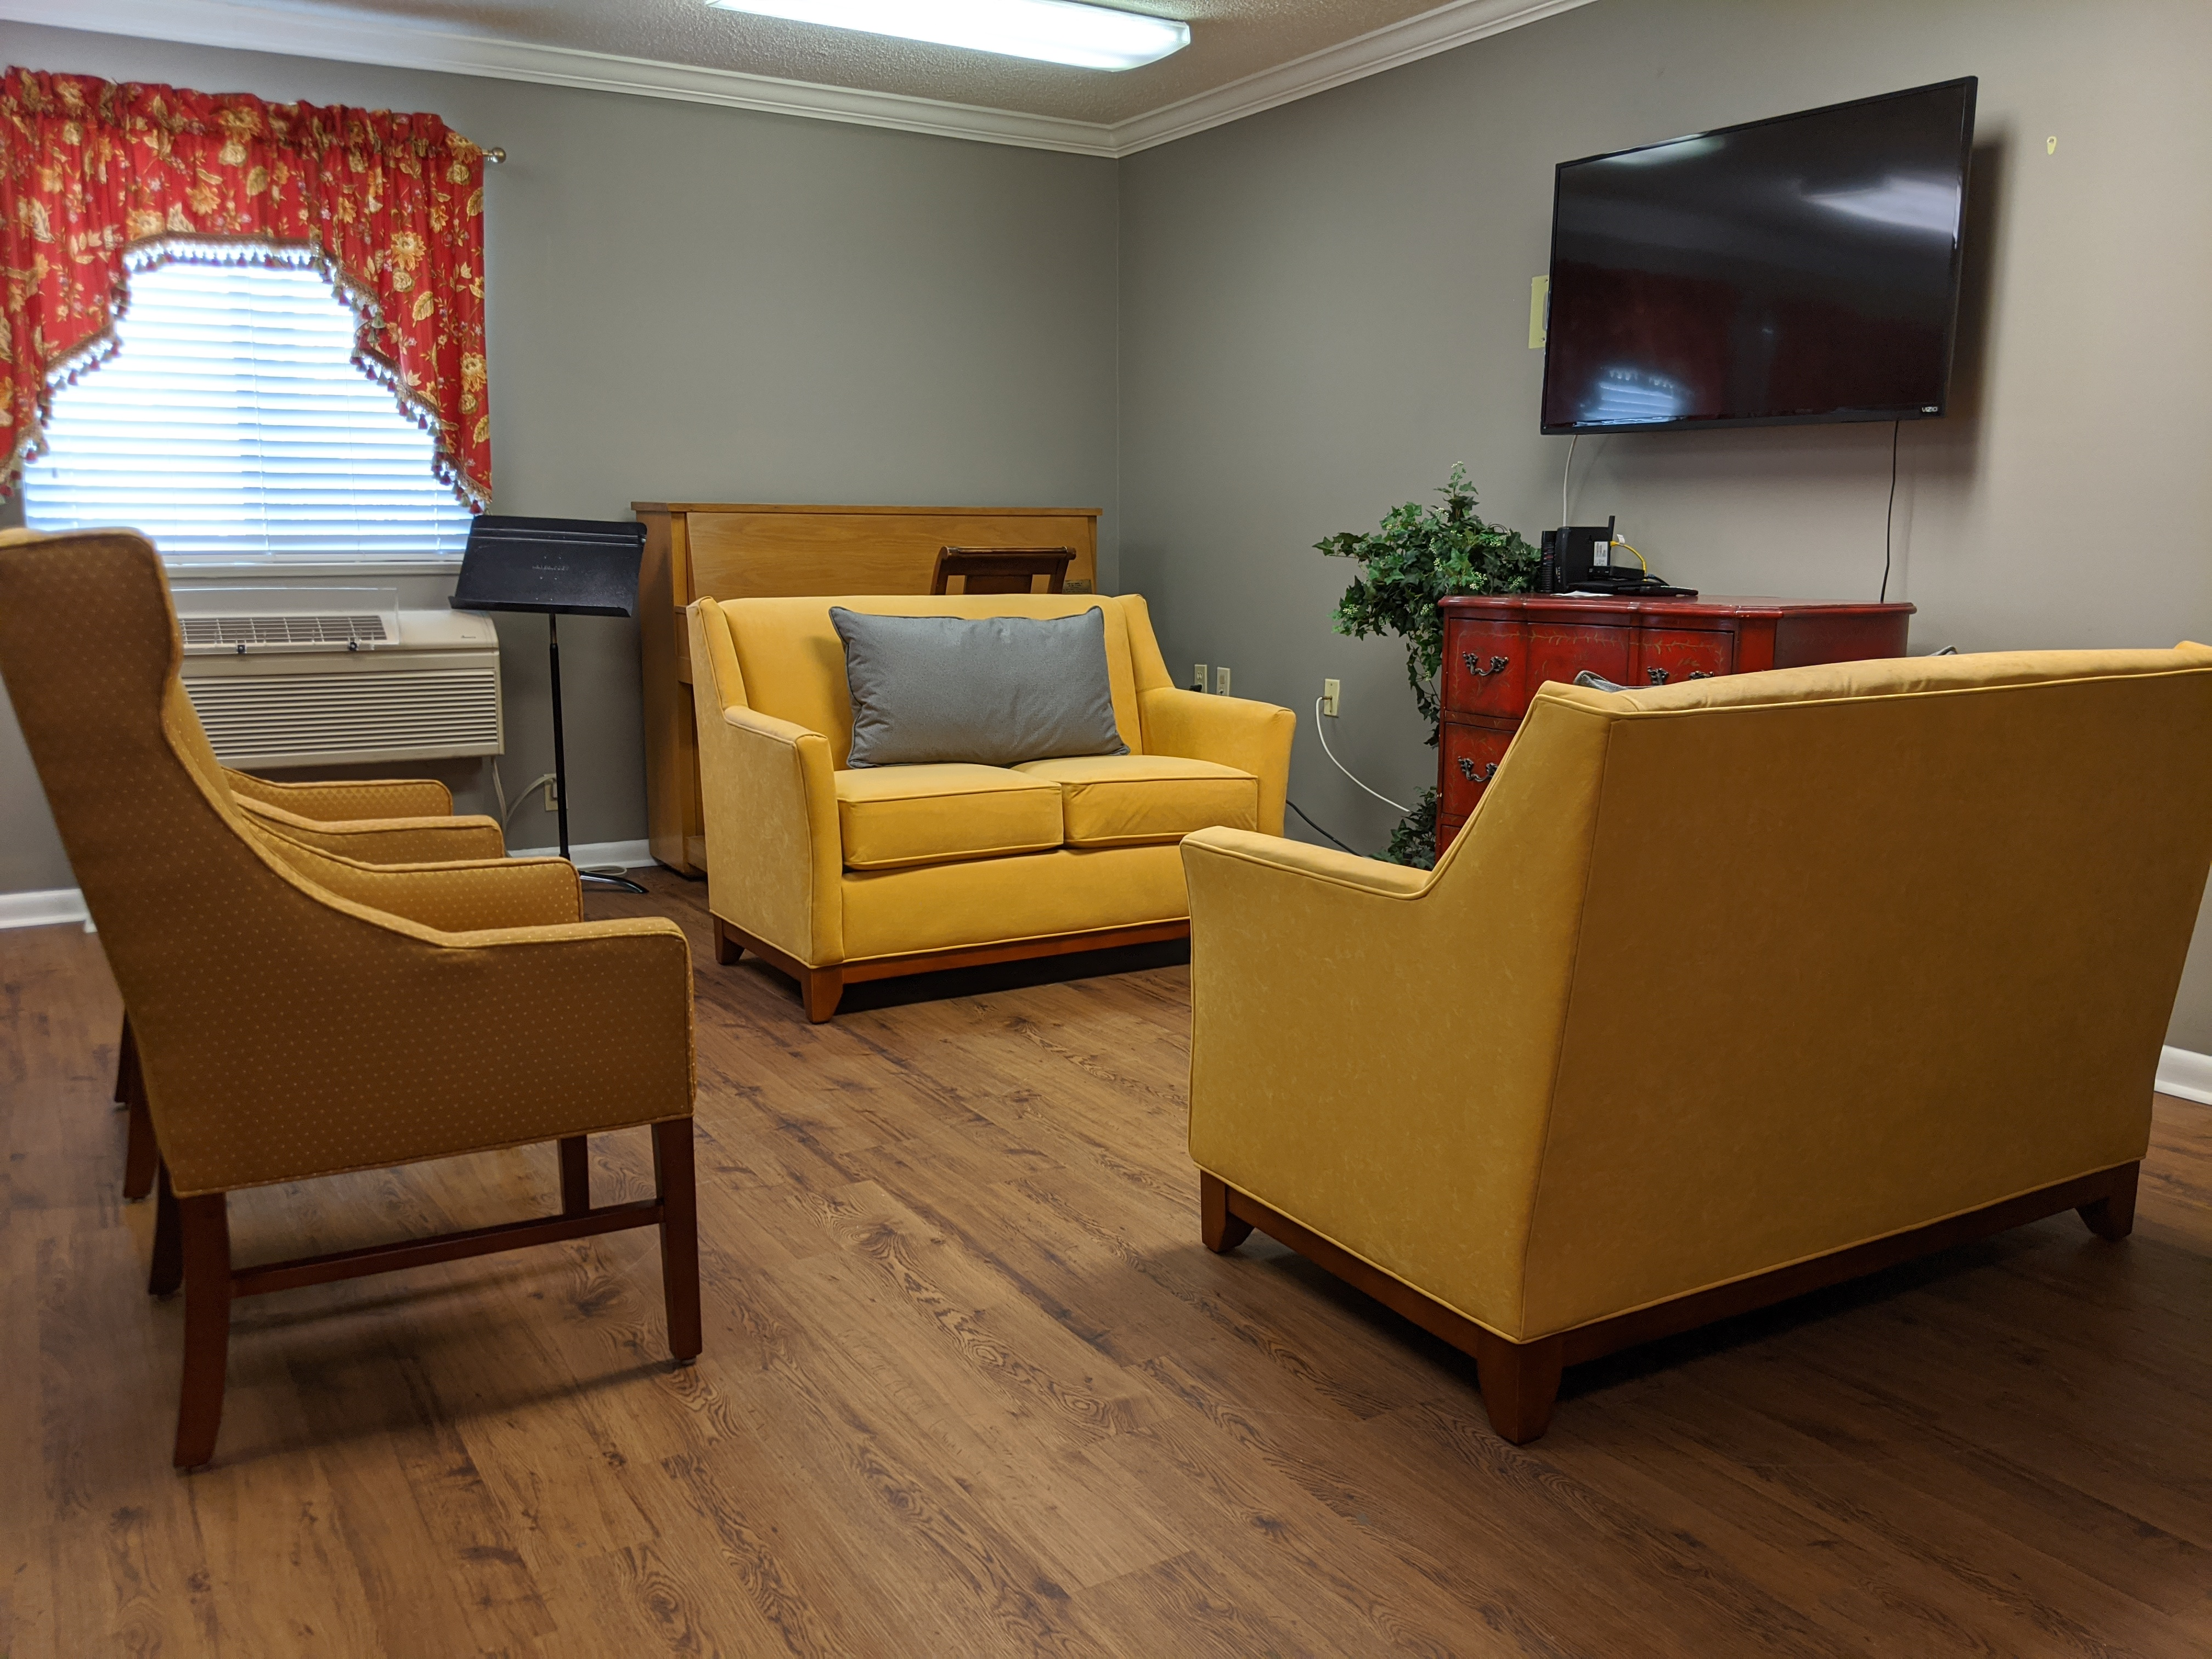 Dogwood Plaza Community Room Seating area